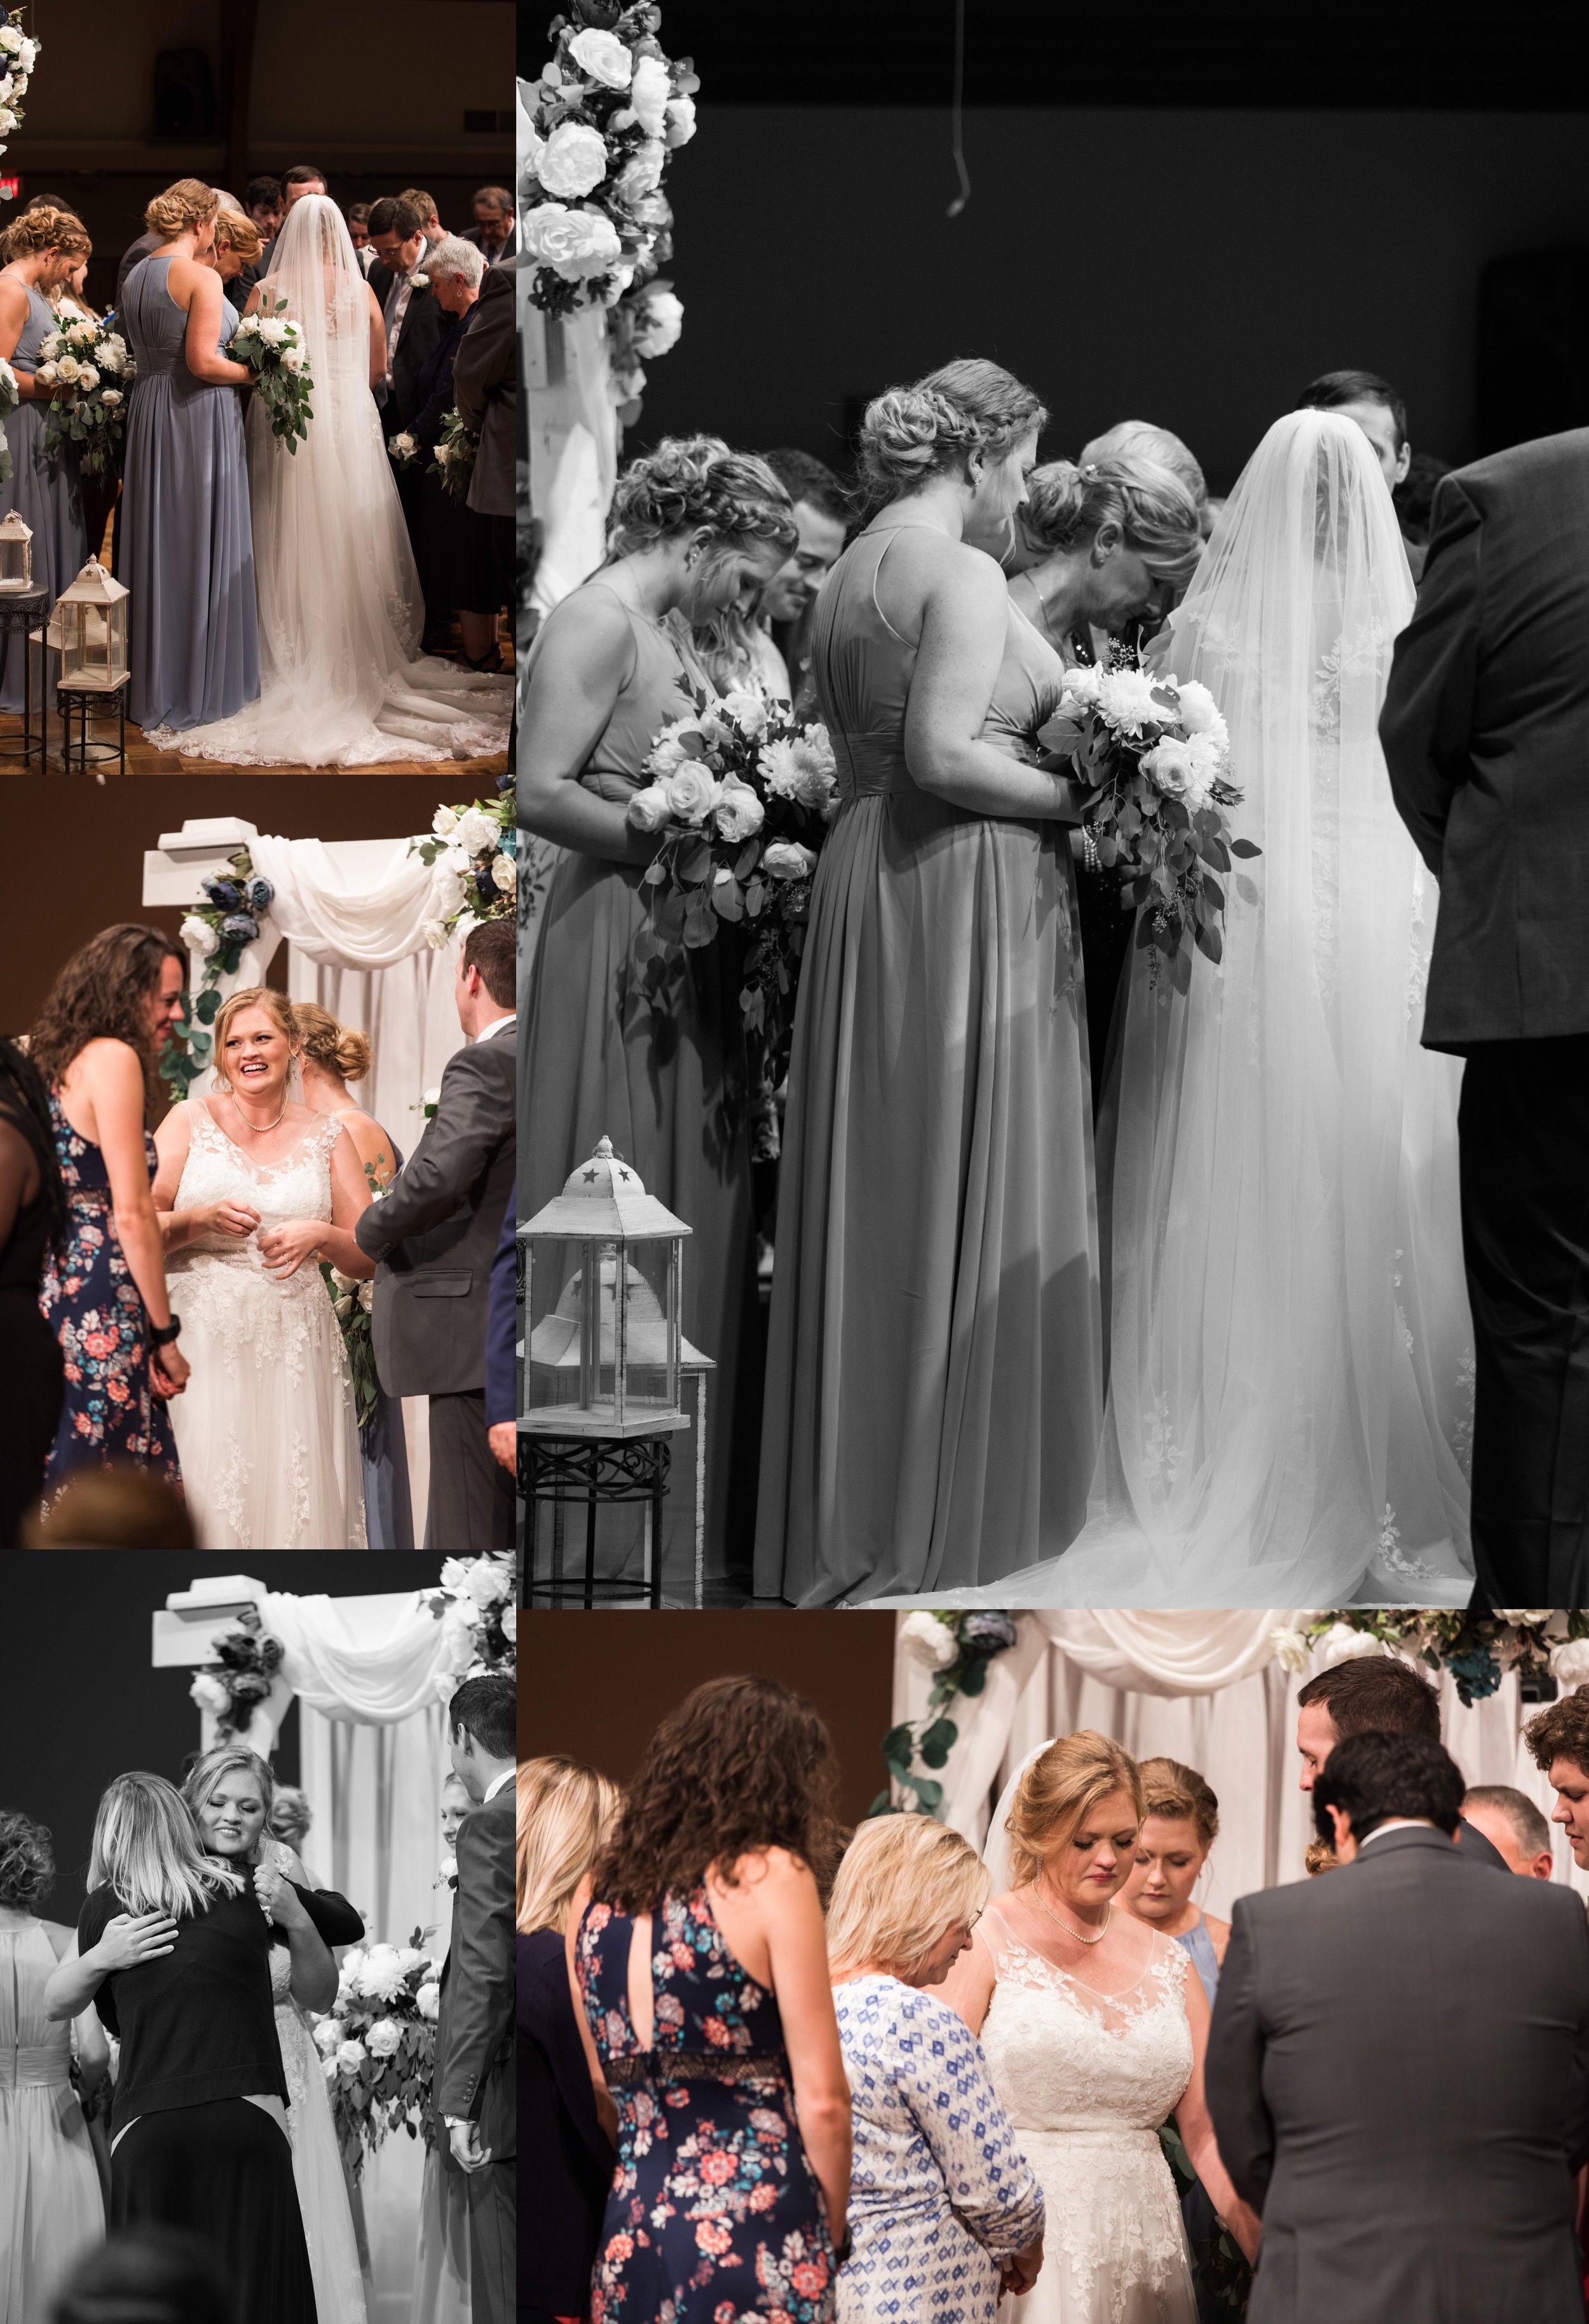 FamilyPrayer-Brand-Fleenor-Wedding-Komorebiphotography